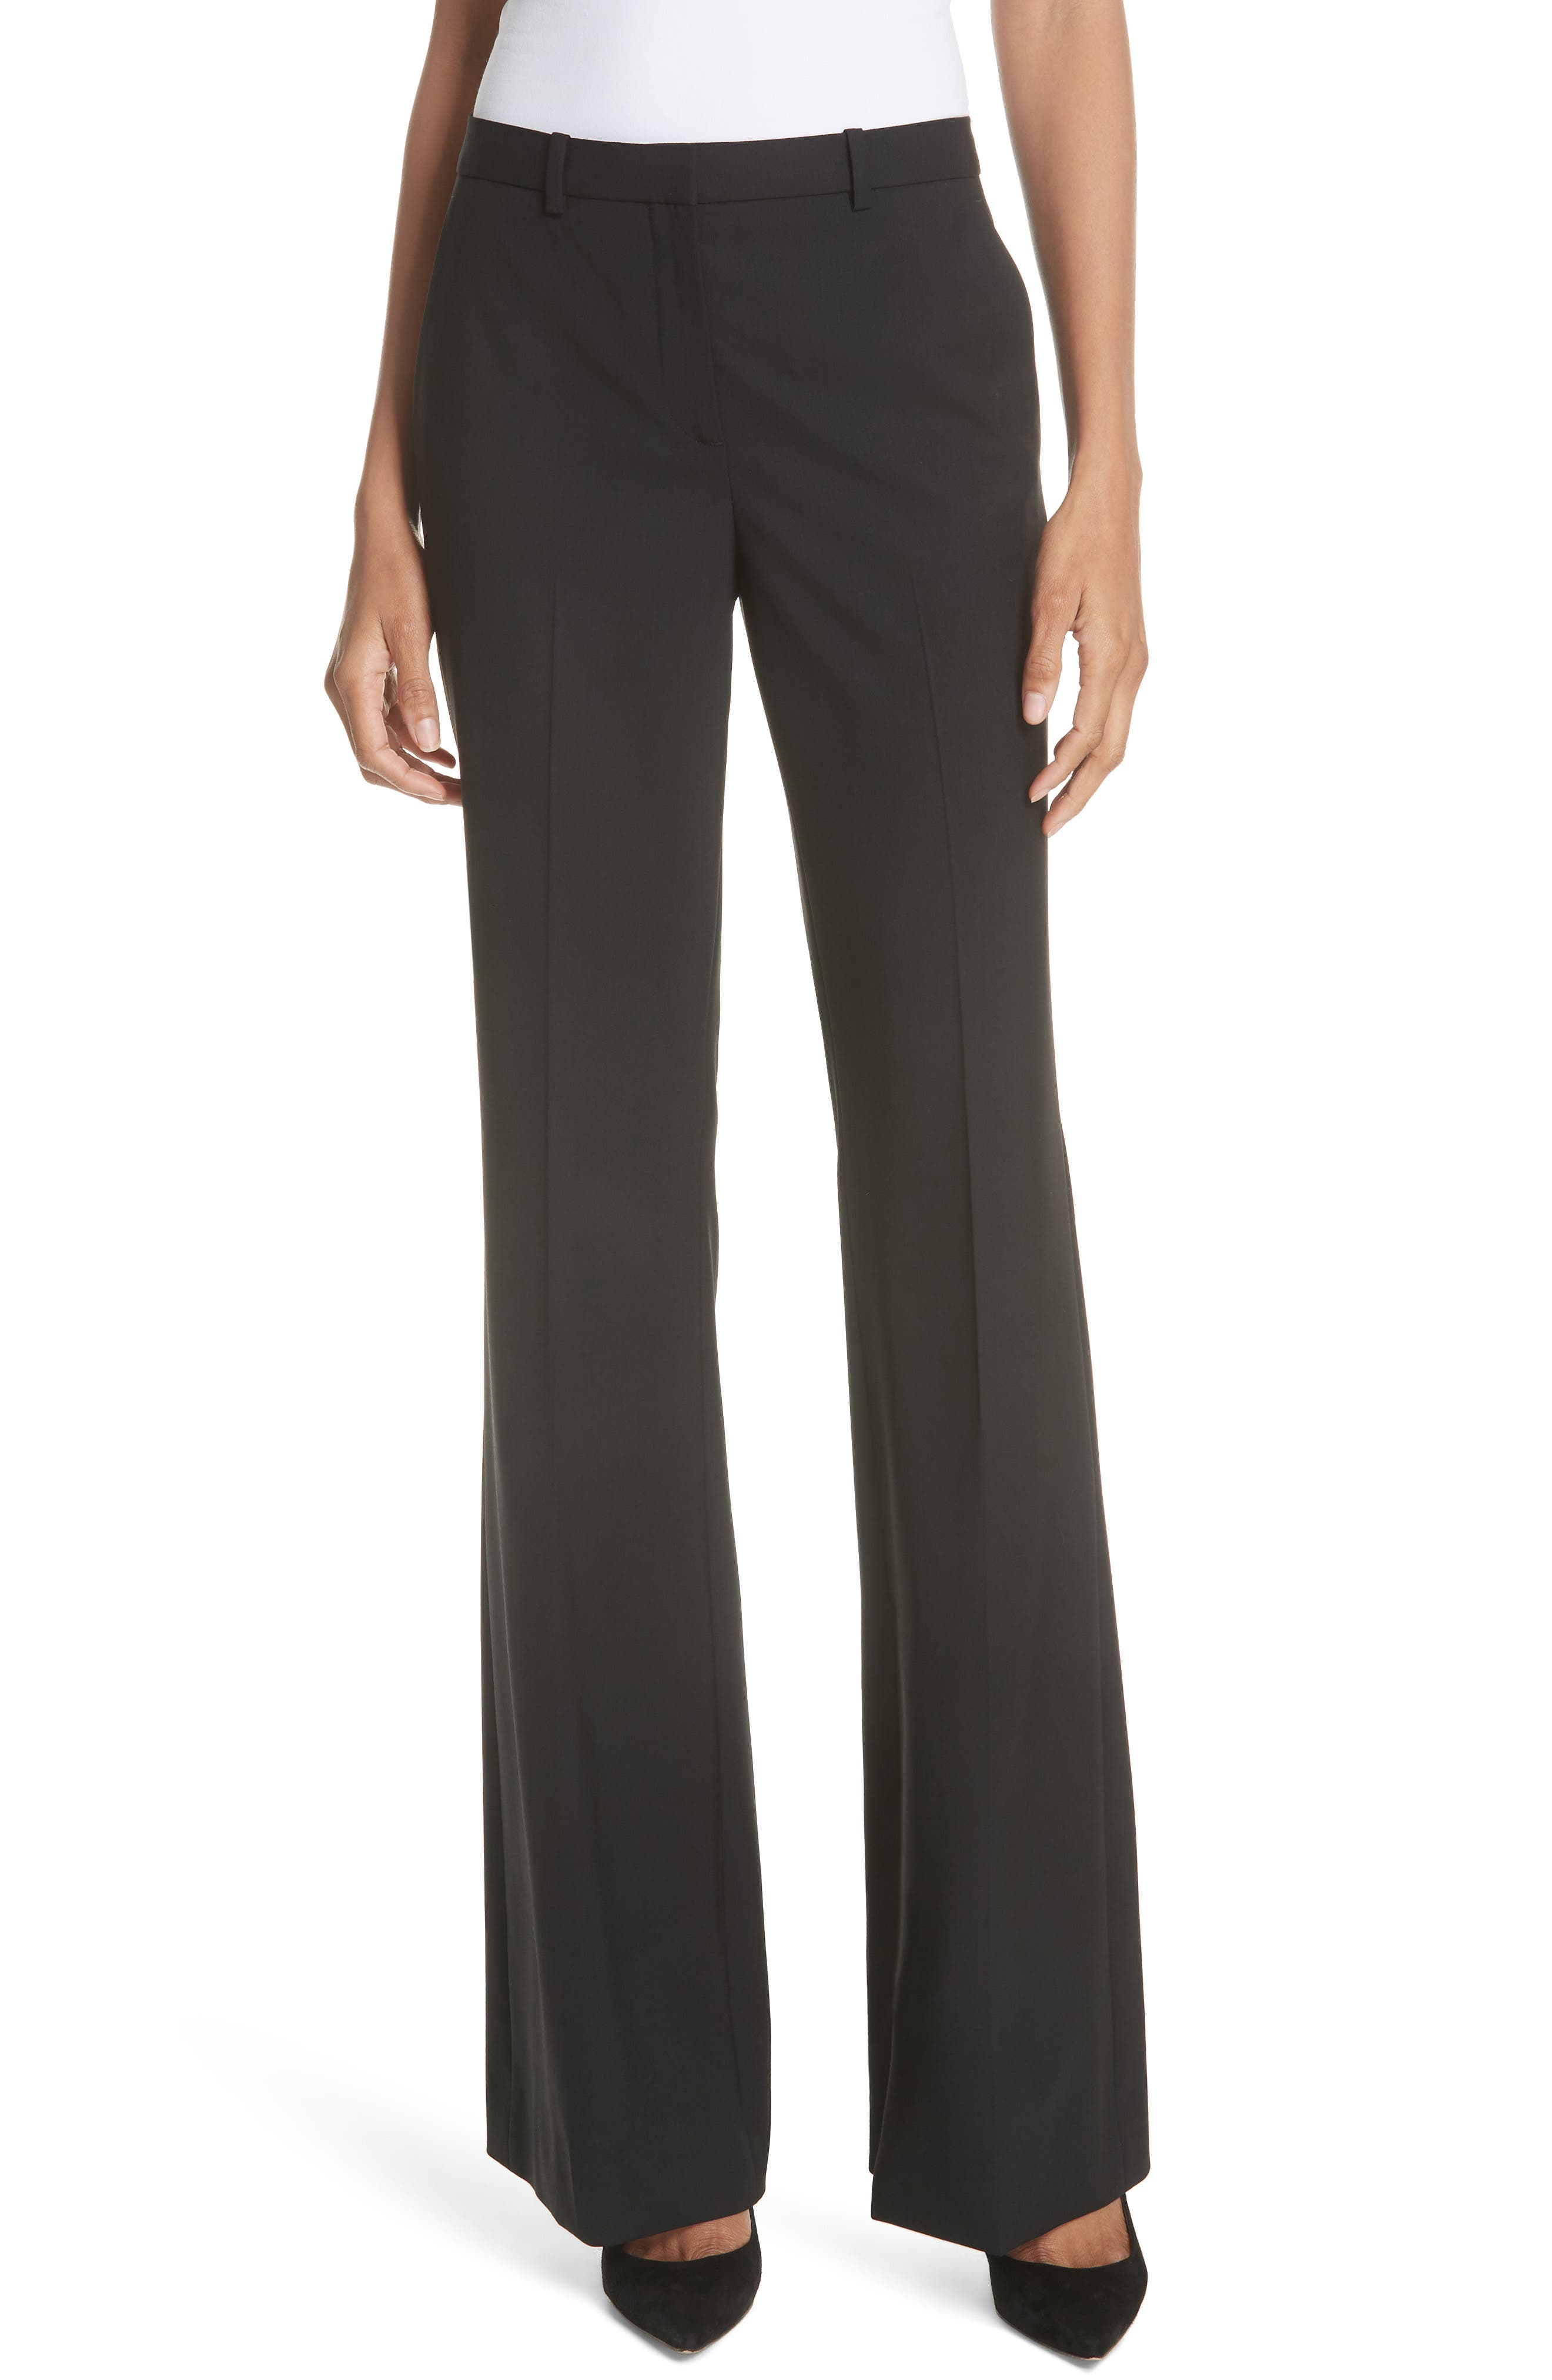 Demitria 2 Stretch Wool Suit Pants,                             Main thumbnail 1, color,                             Black